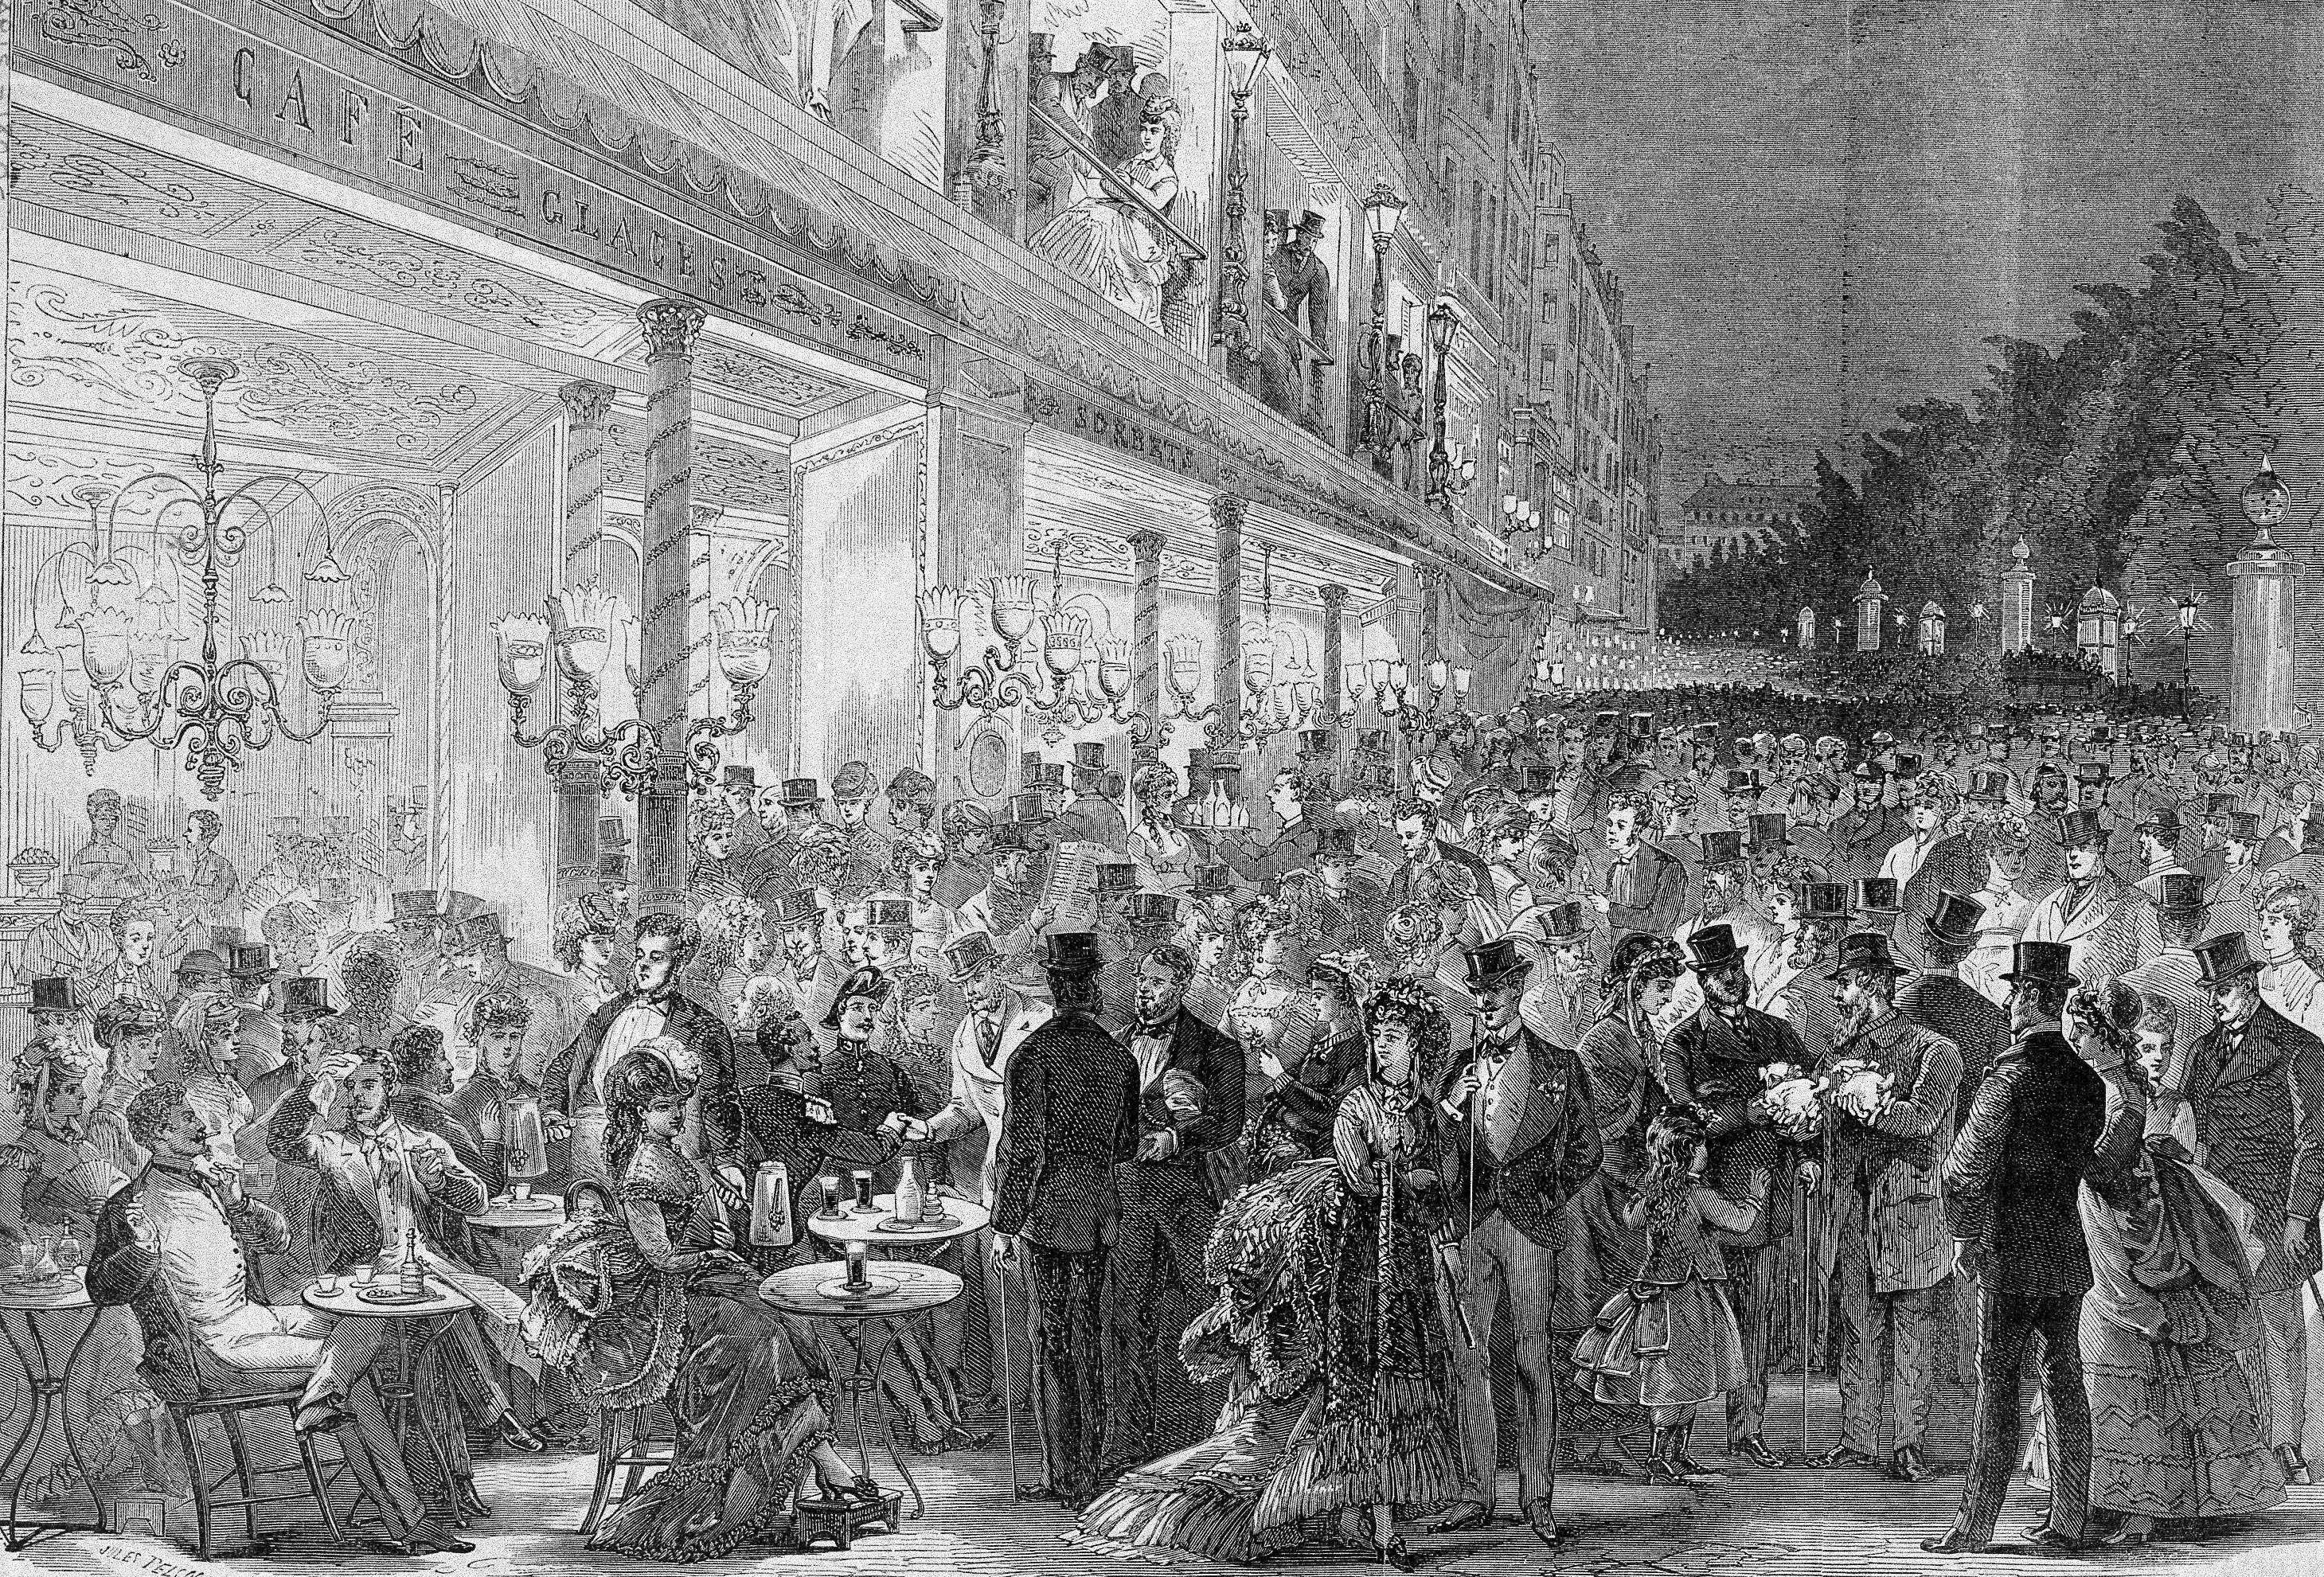 1863 paris france illustration